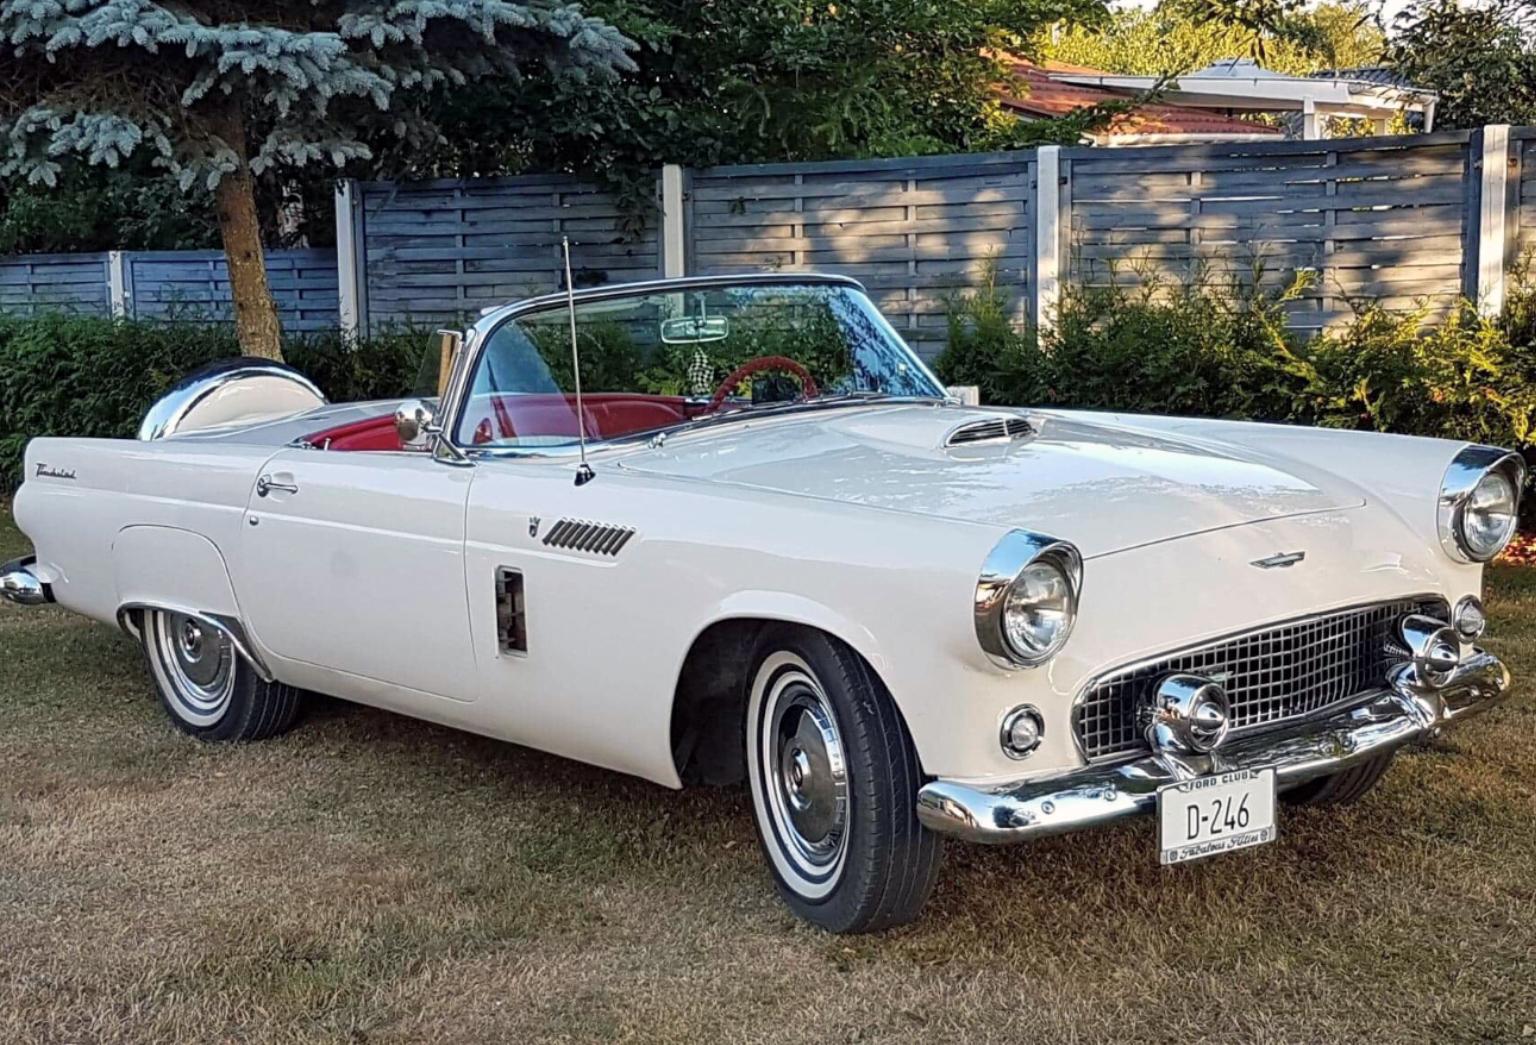 350-1956 Ford Thunderbird 01. Eiere- medlem 350 Ju